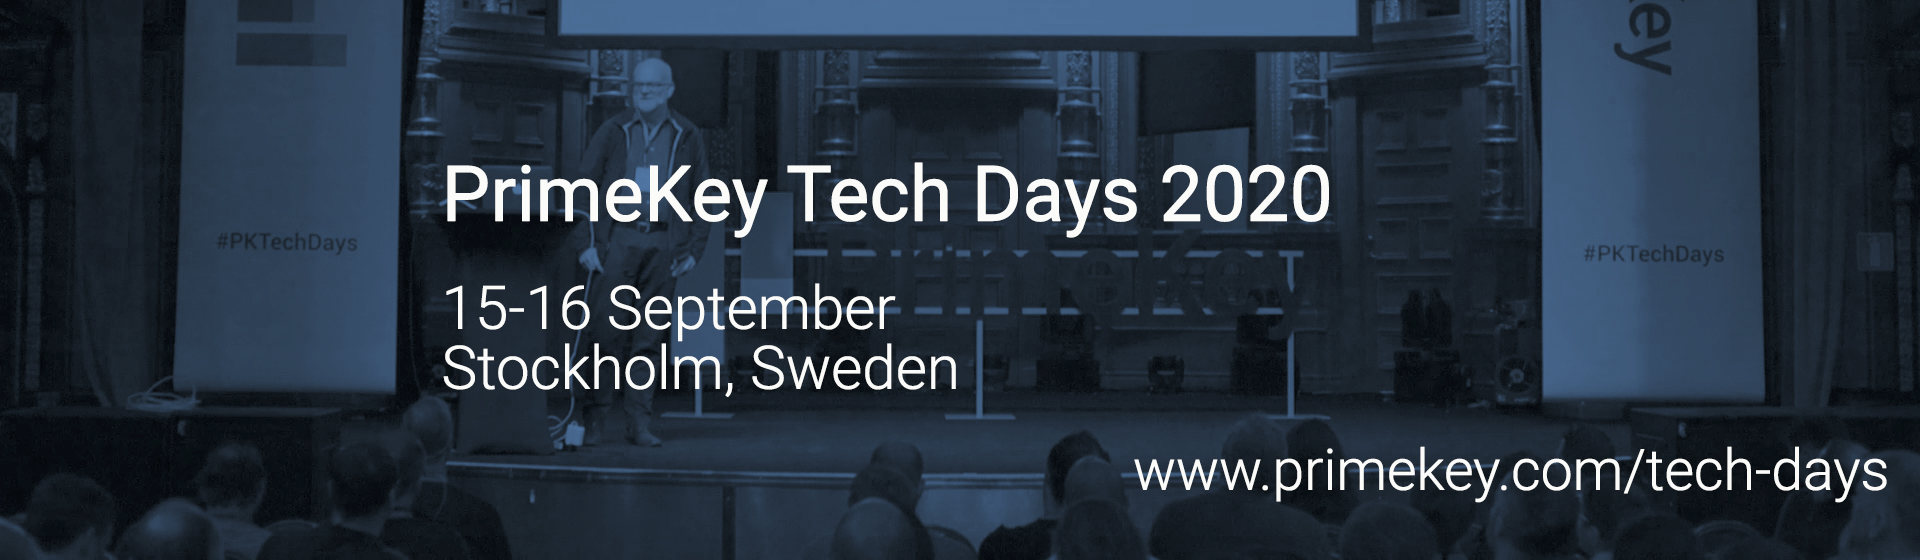 Primekeytechdays2020